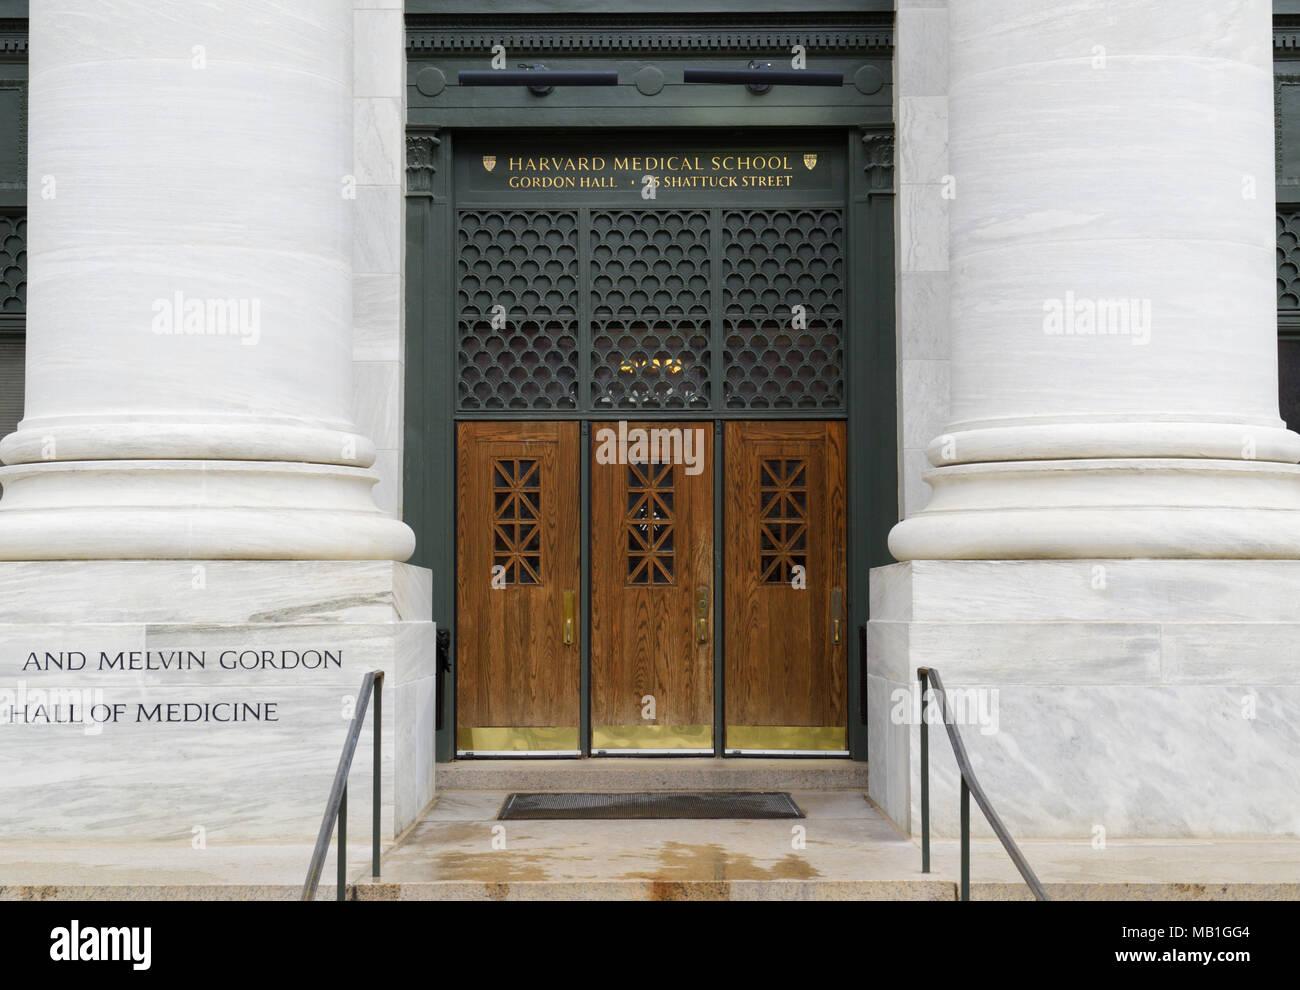 Harvard Medical School entrance, Boston, MA - Stock Image